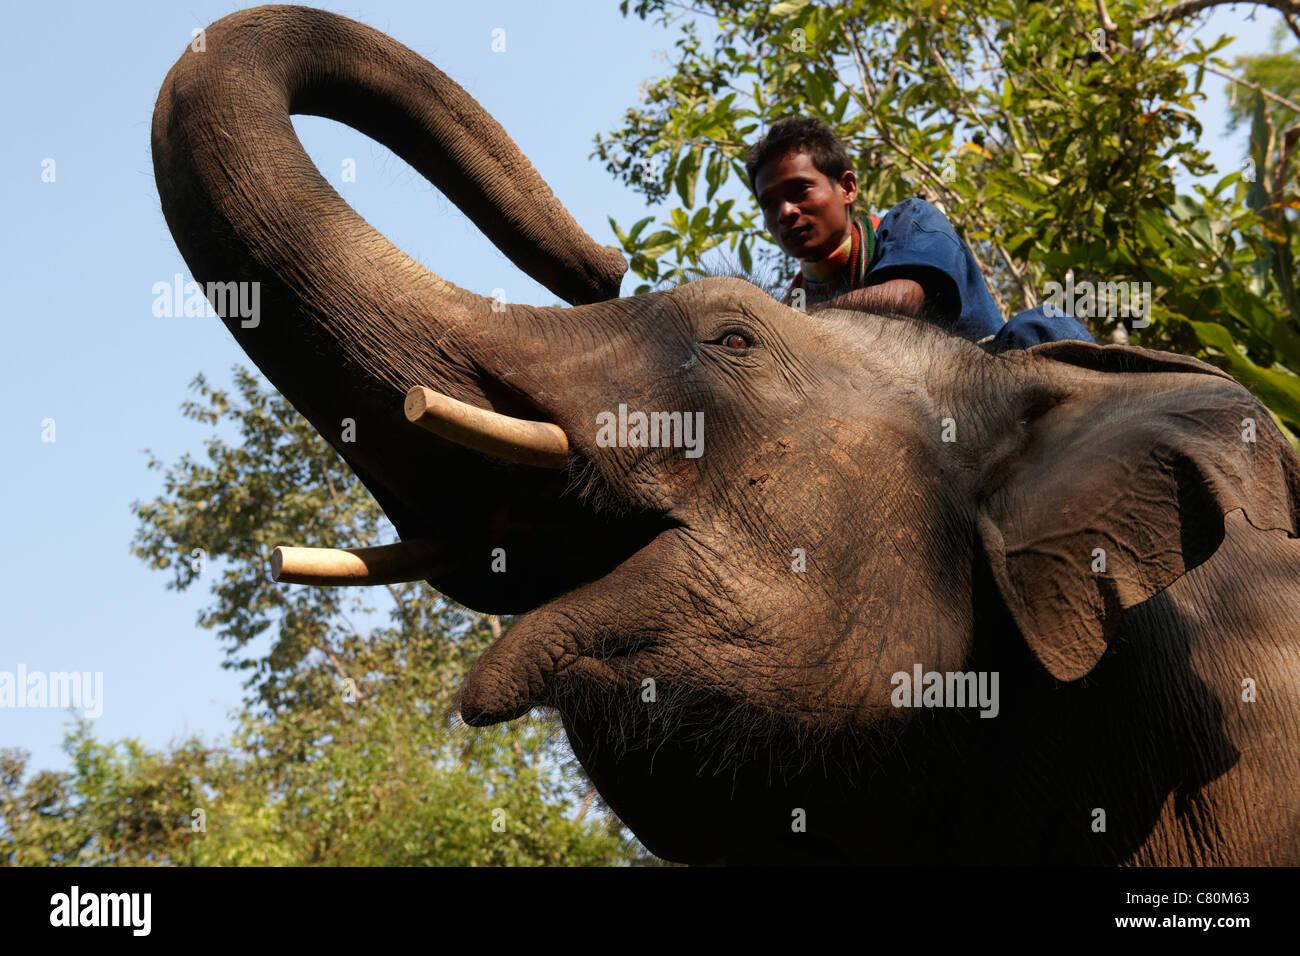 Thailand, Chiang Rai, Golden Triangle, Four Seasons Golden Jungle, Man Riding on Elephant - Stock Image